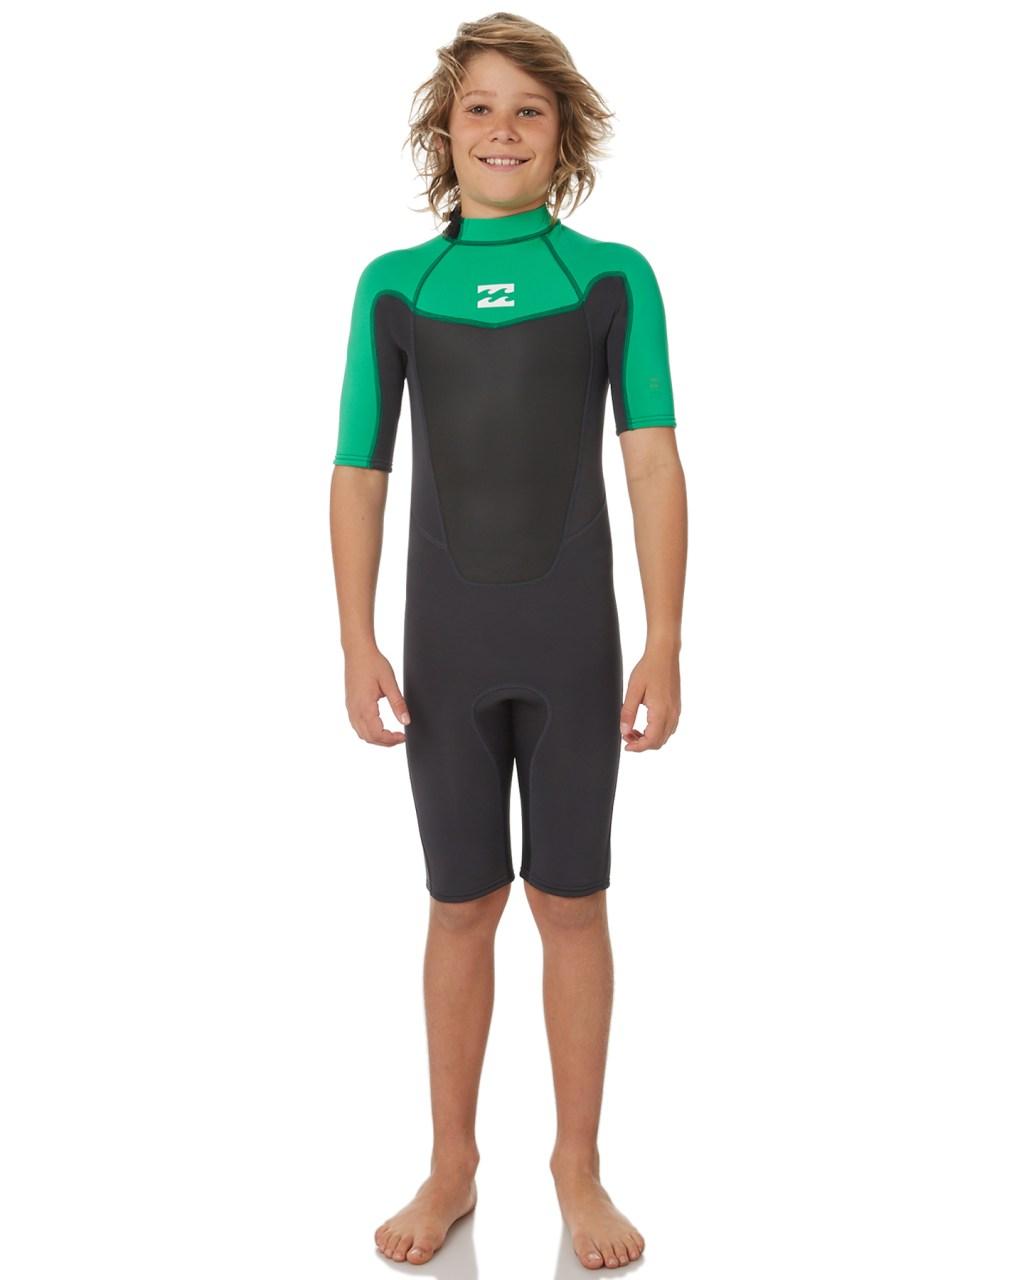 a1bd2f8ff2 Billabong Boys Absolute 202 Bz Springsuit Green Surfing Wetsuits ...